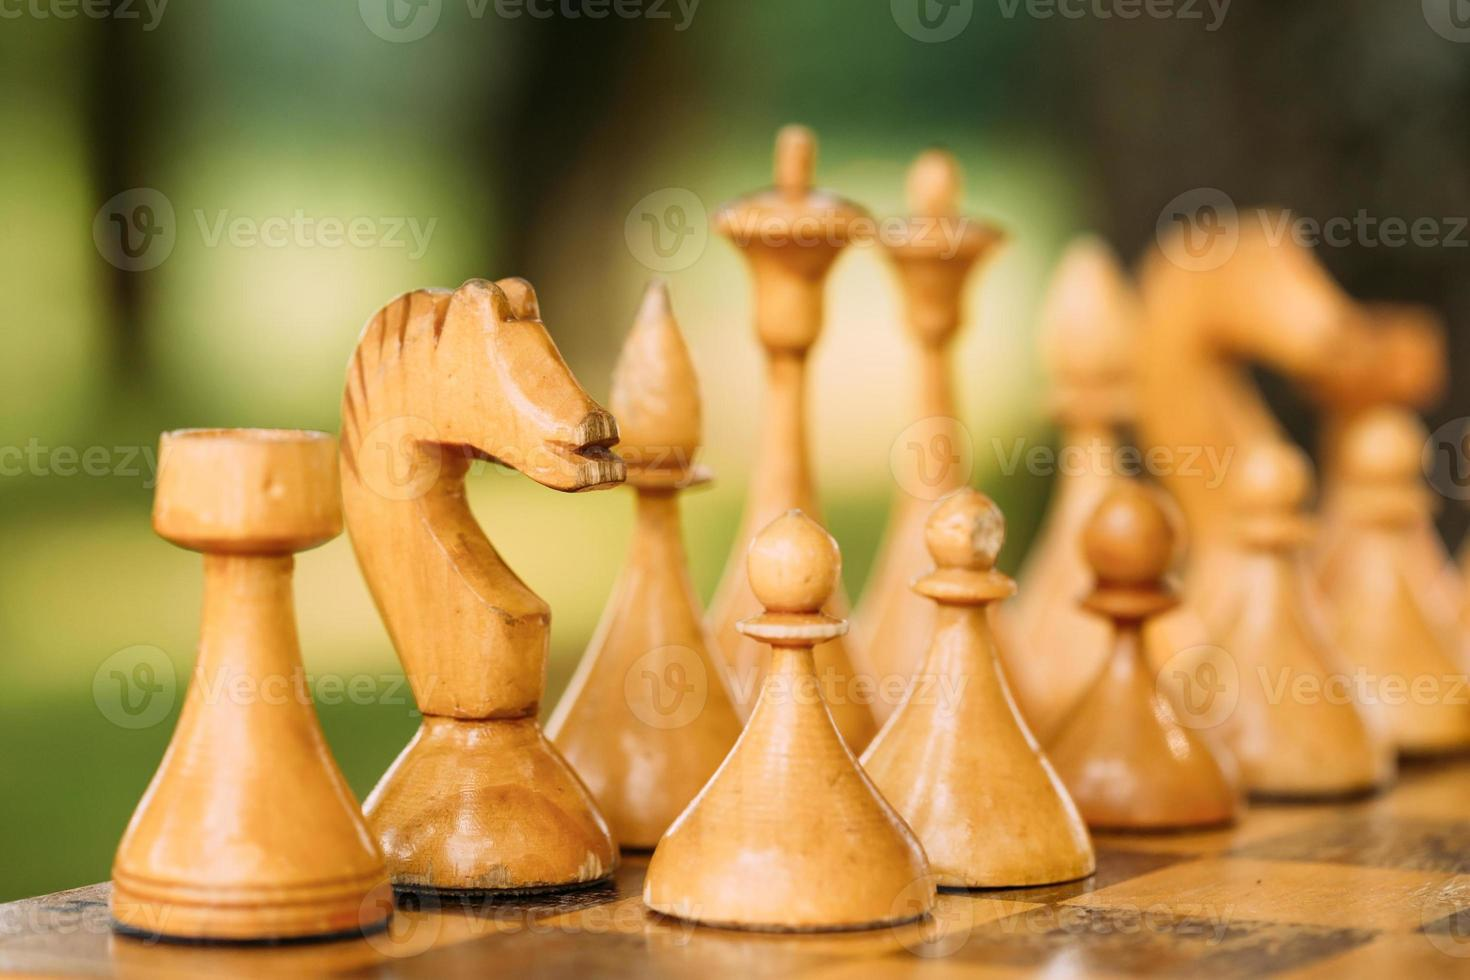 viejo vintage ajedrez de pie en el tablero de ajedrez foto